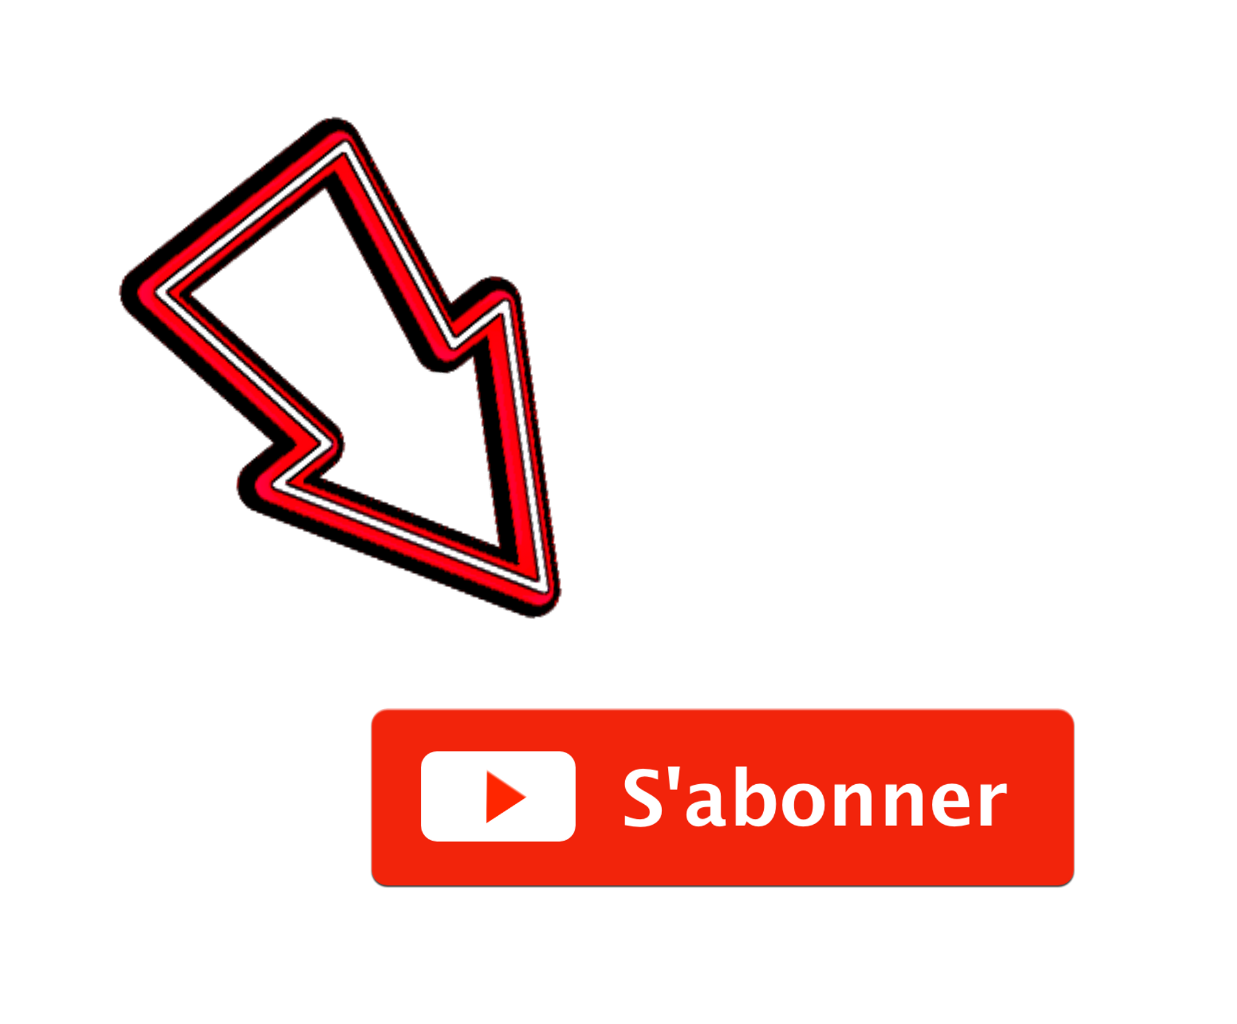 Youtube clipart nature. Logoyoutube logo red